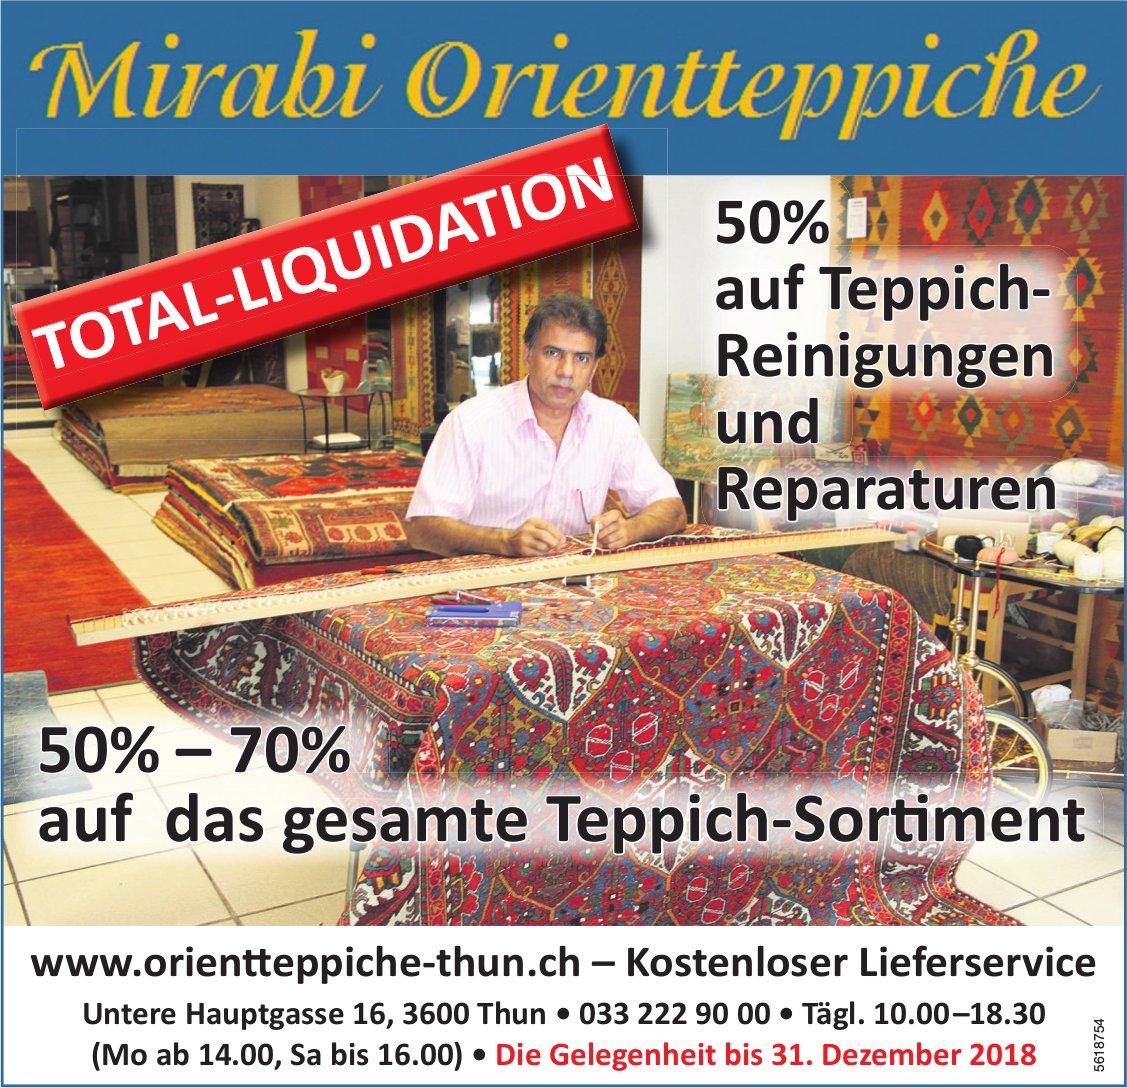 Mirabi Orientteppiche, Thun - TOTAL-LIQUIDATION